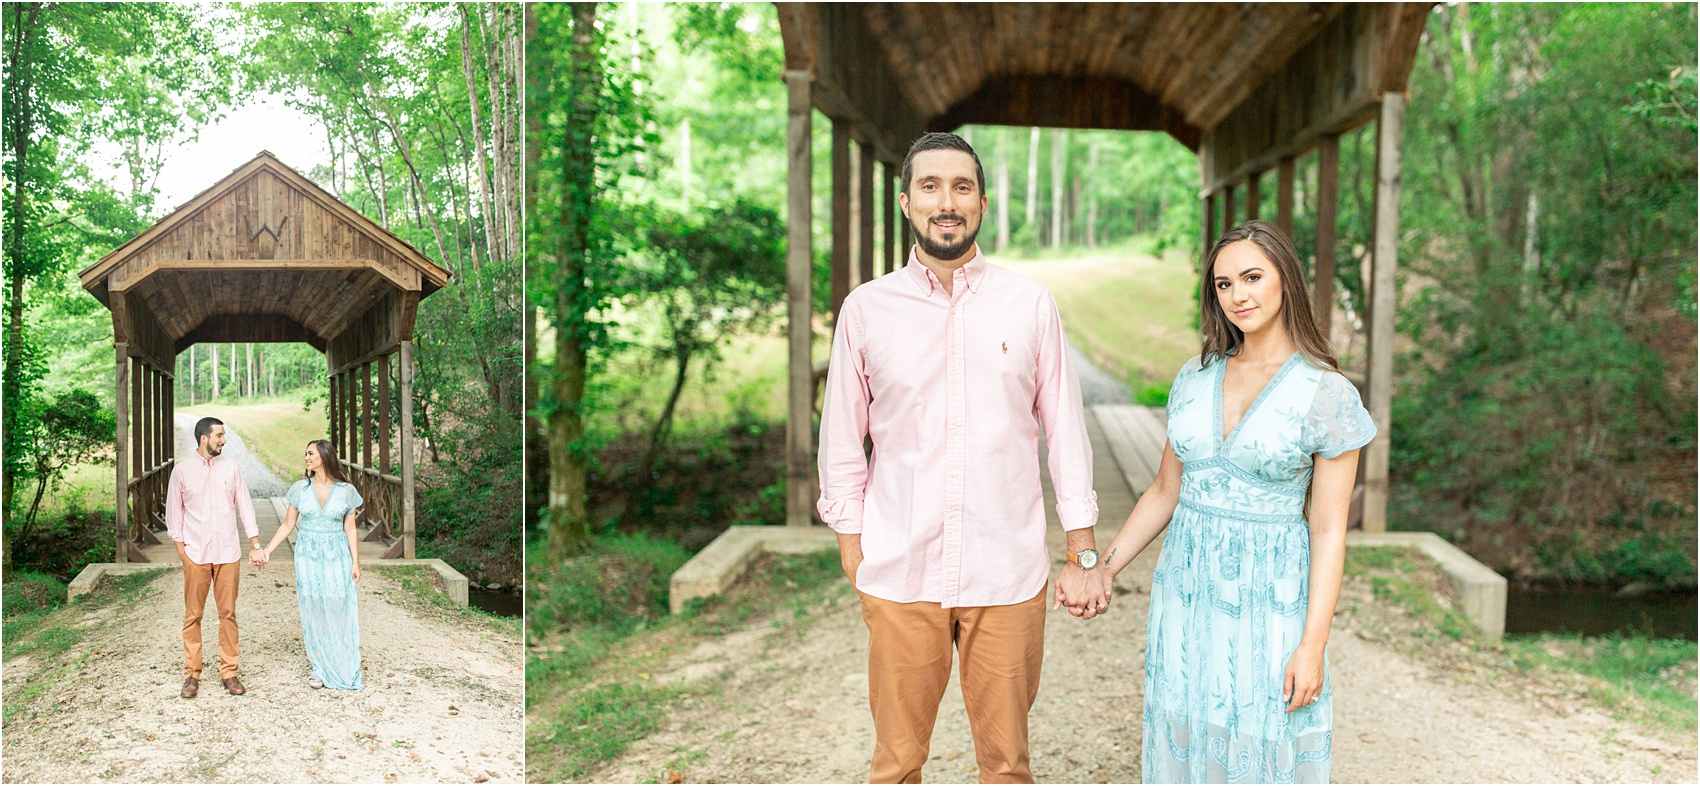 Savannah Eve Photography LLC- Tiffani & Josh Beck @ The Walters Barn- Blog-12.jpg